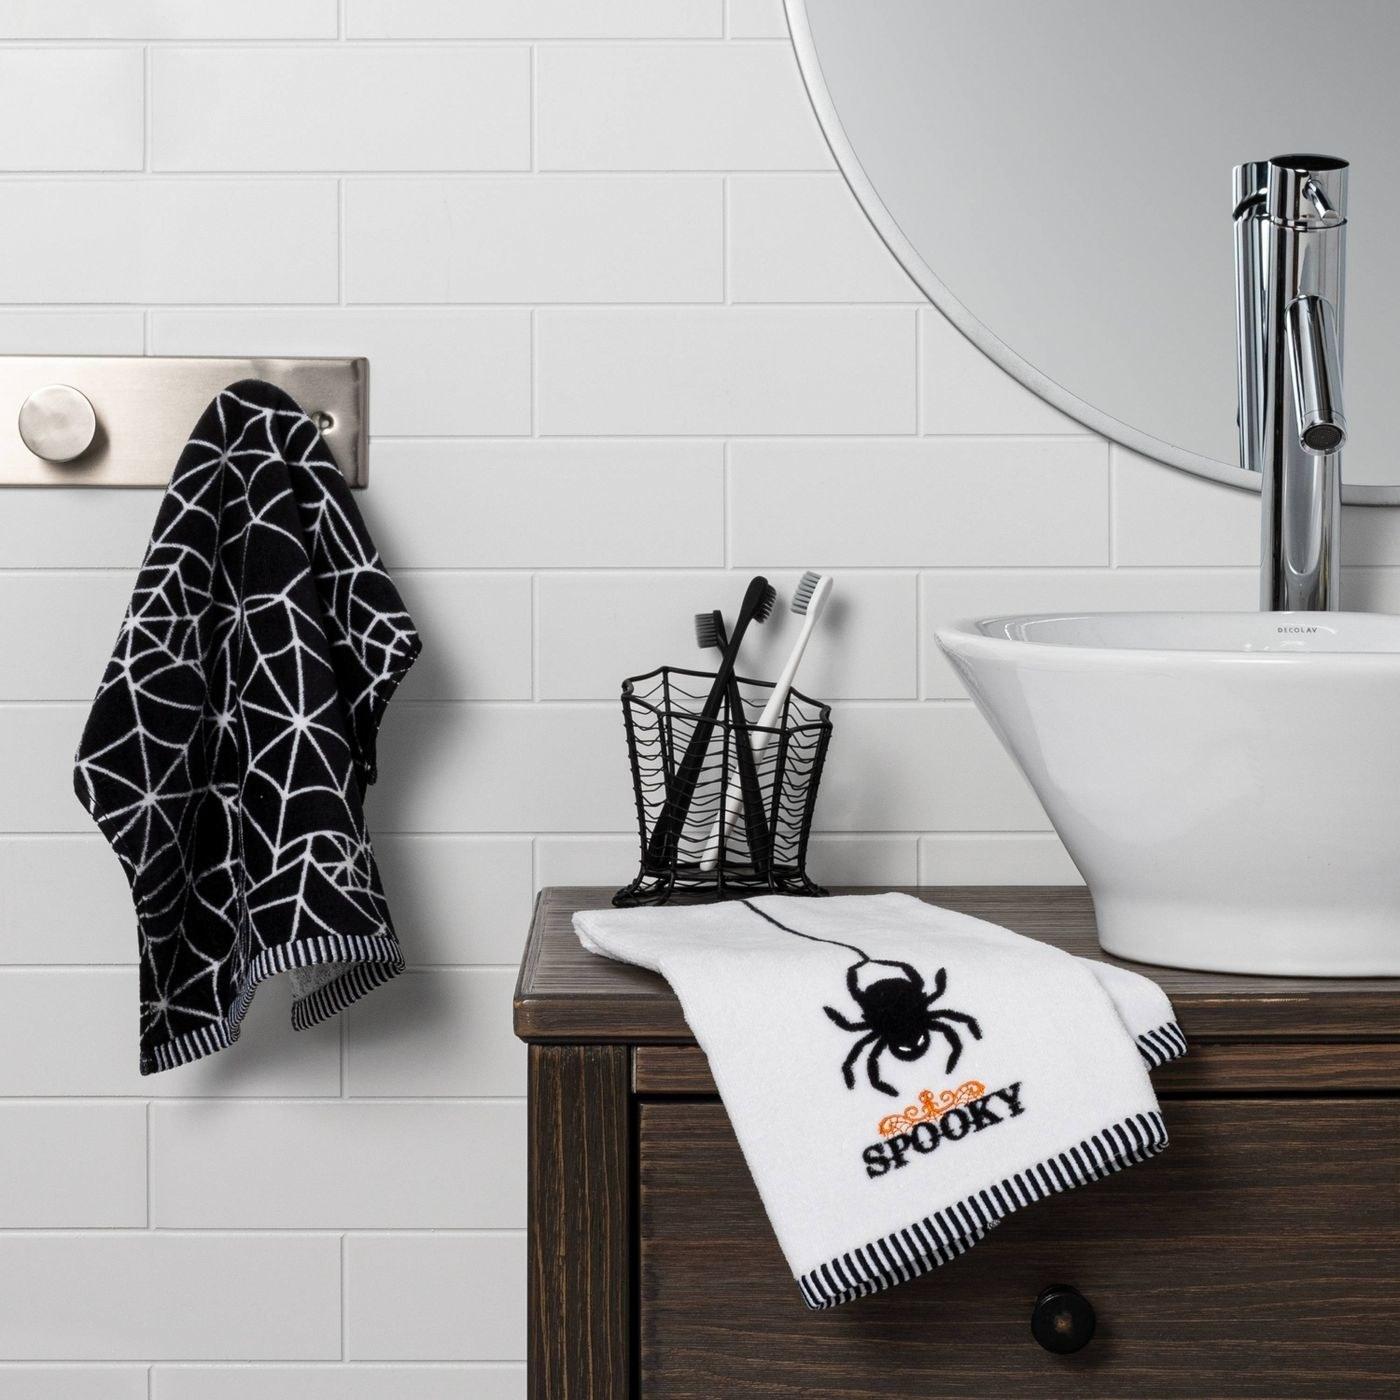 A set of halloween hand towels